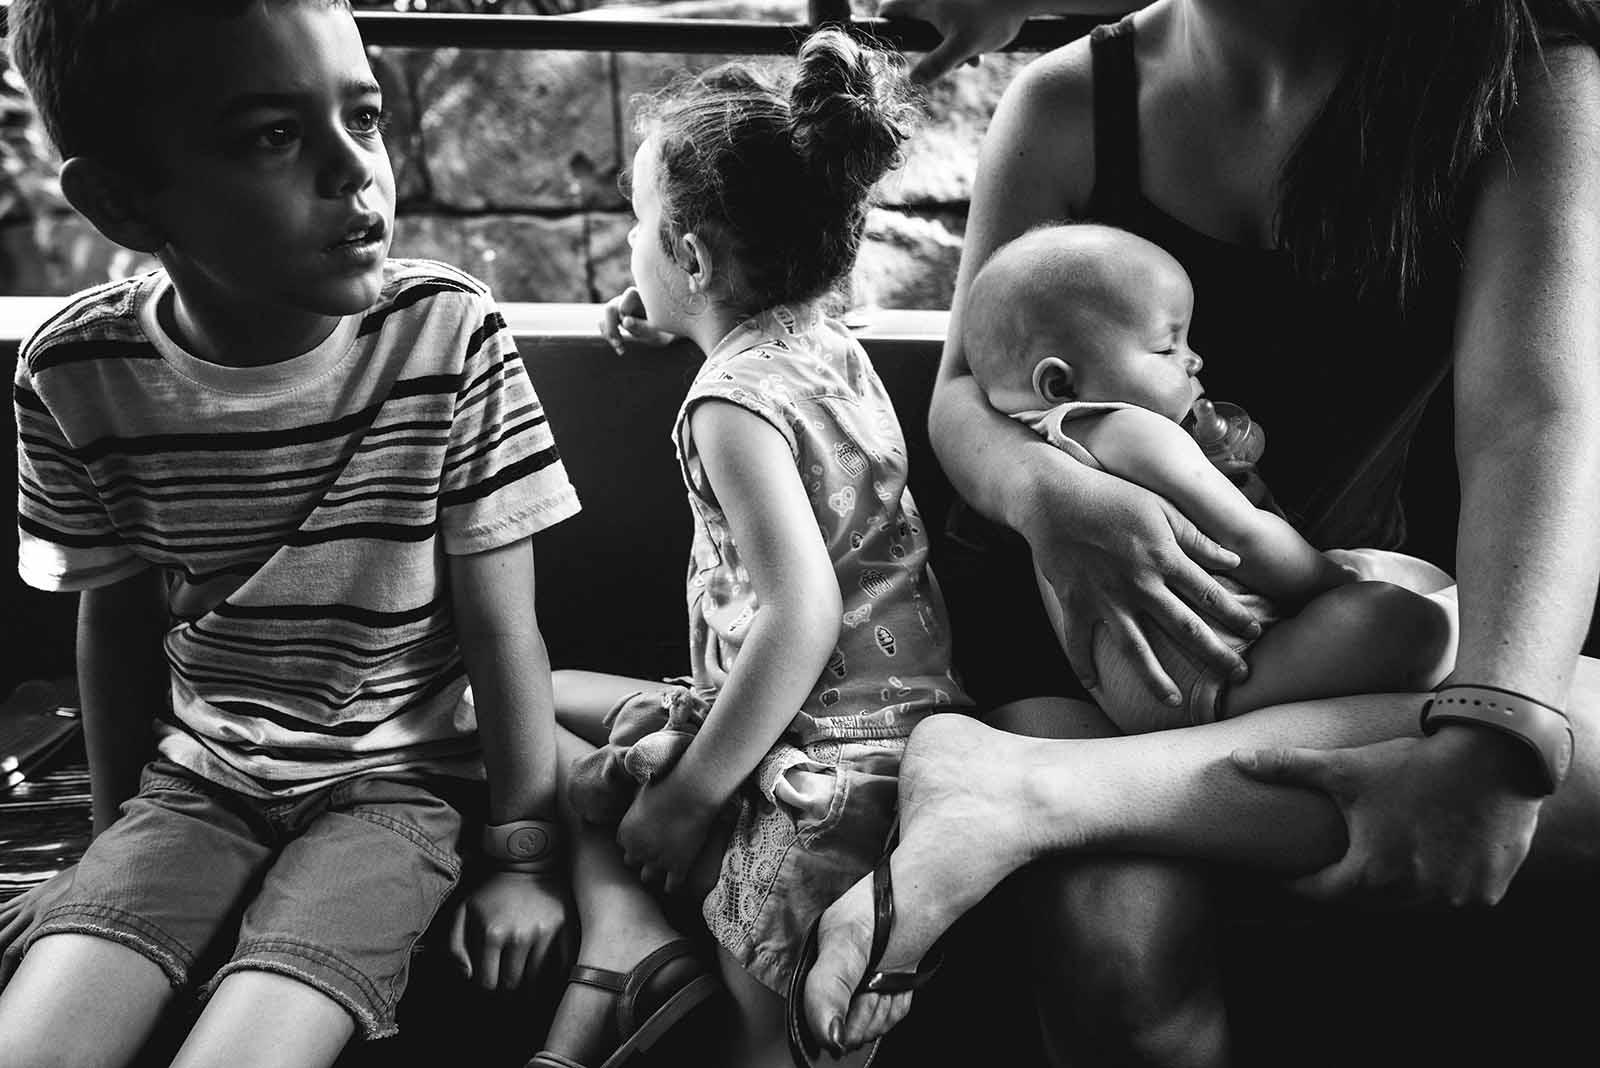 disney photo of child reaction black and white